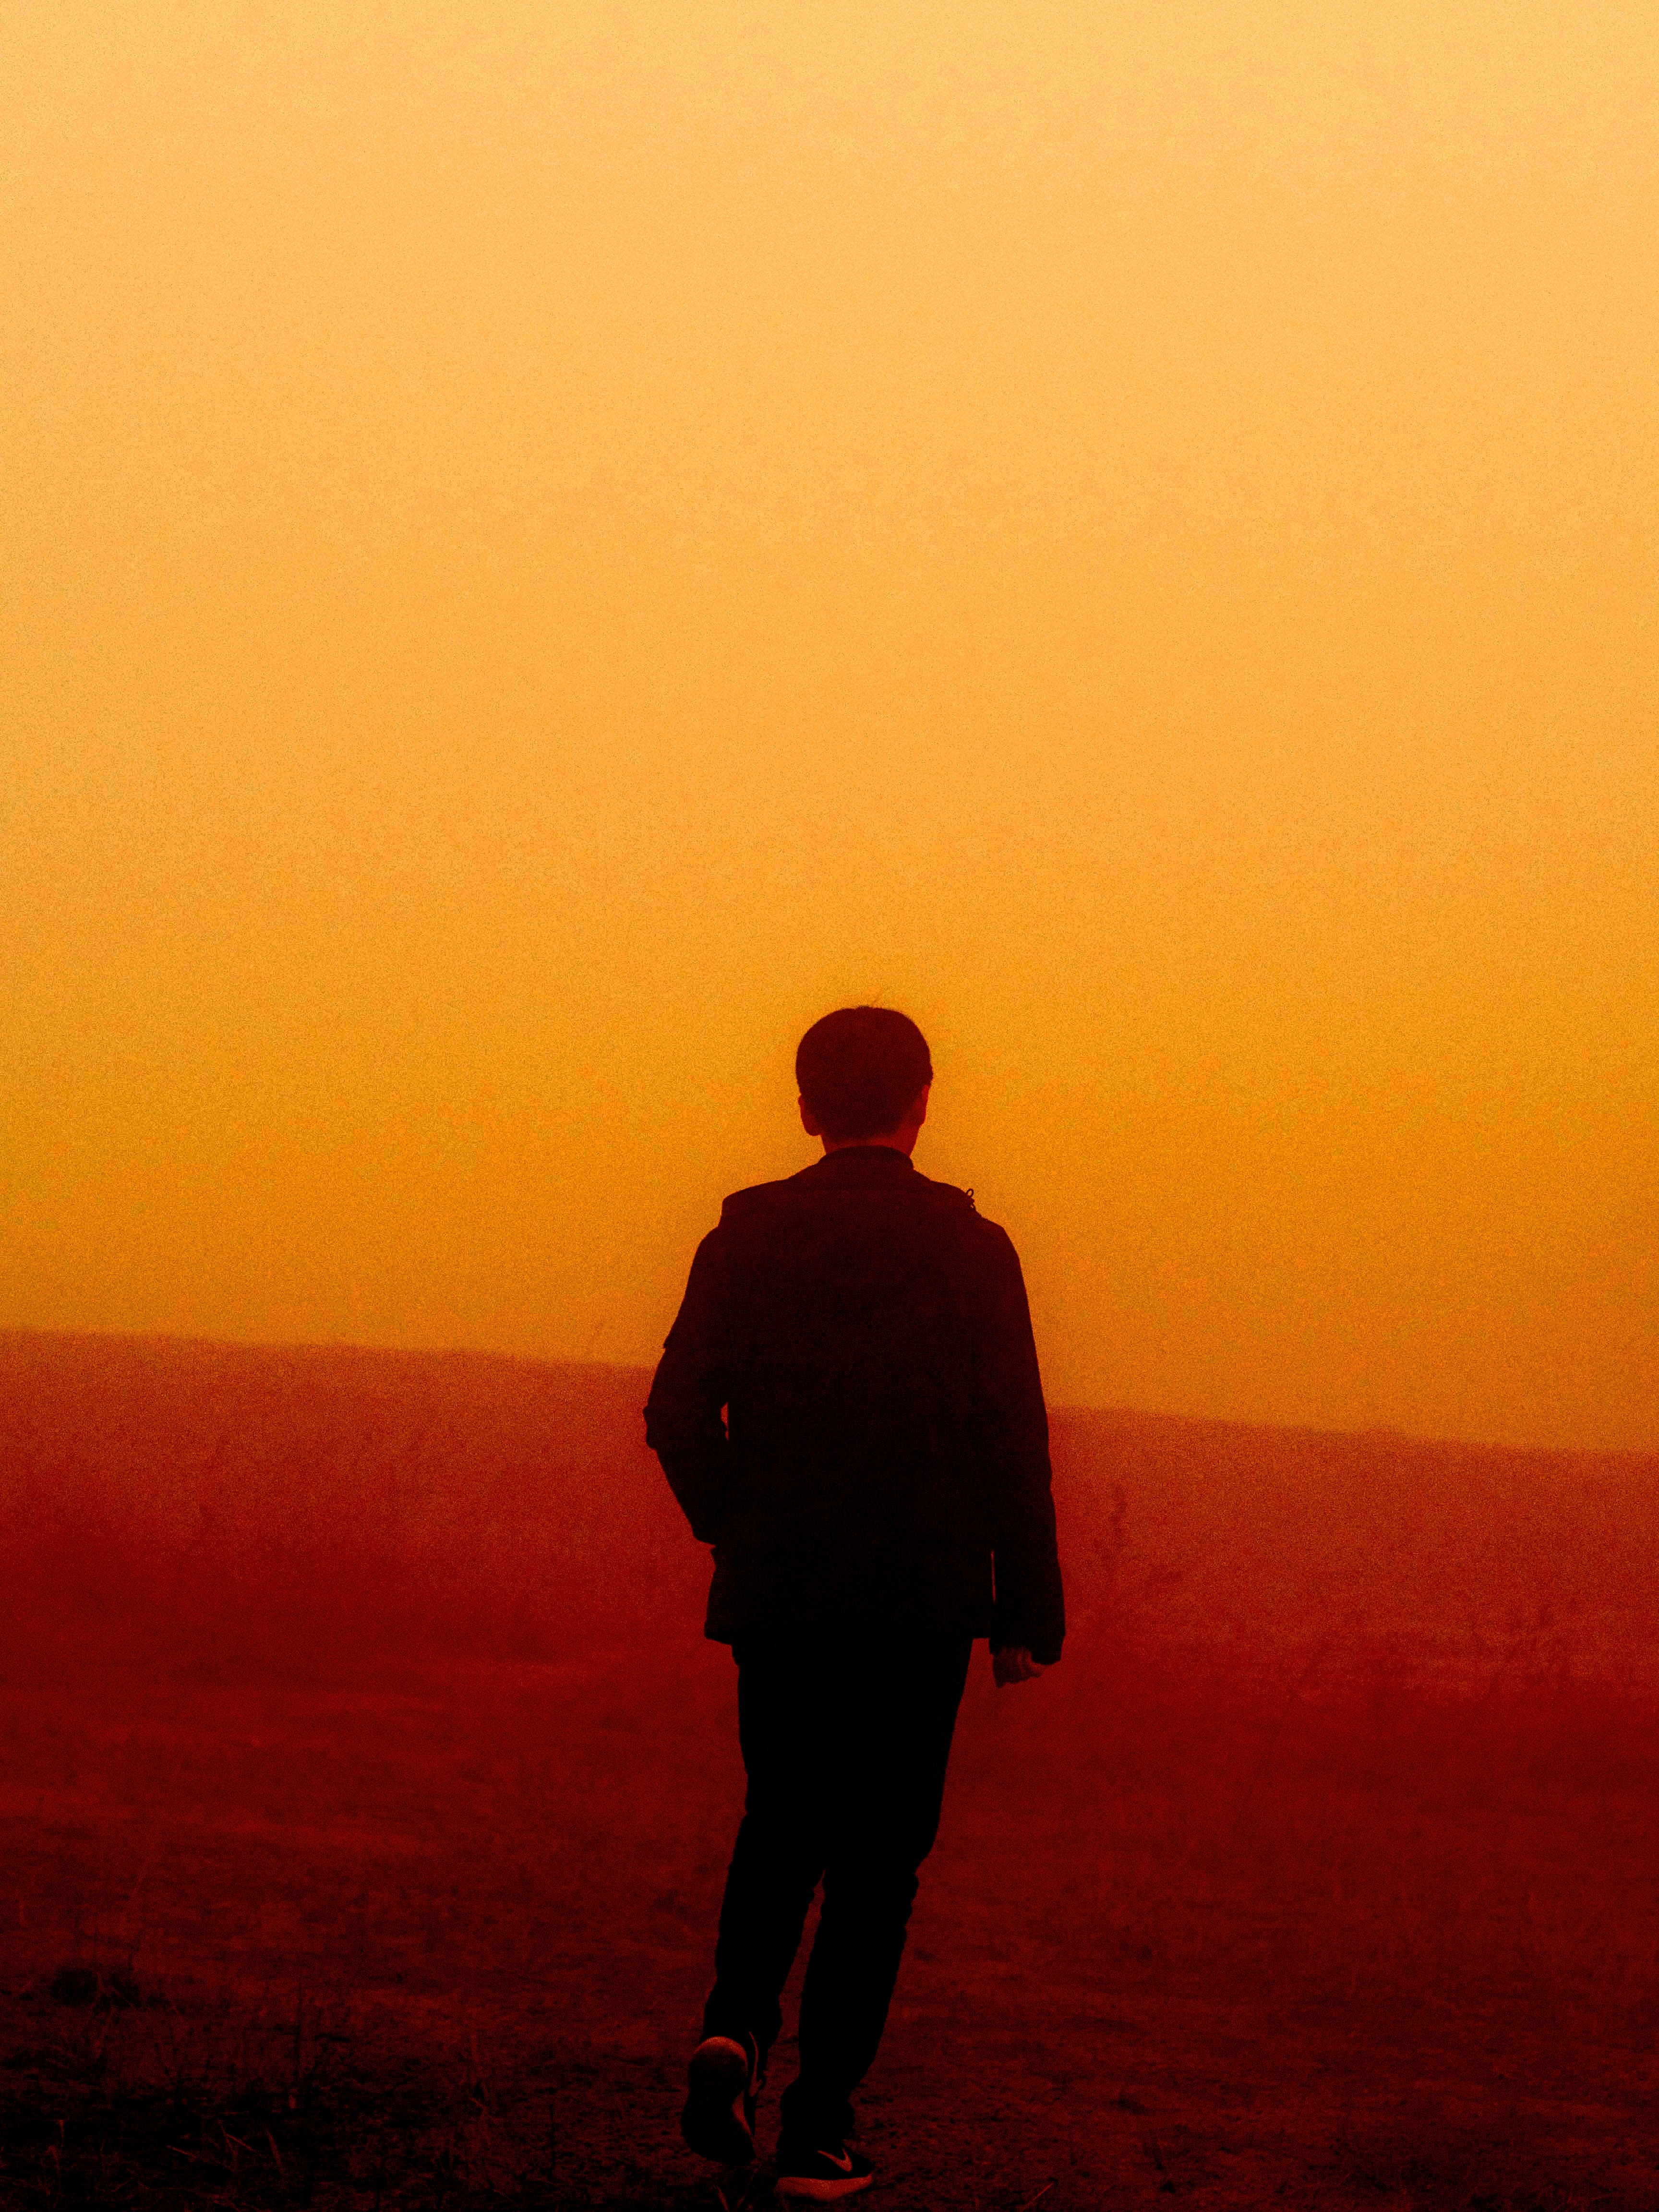 person walking on misty area